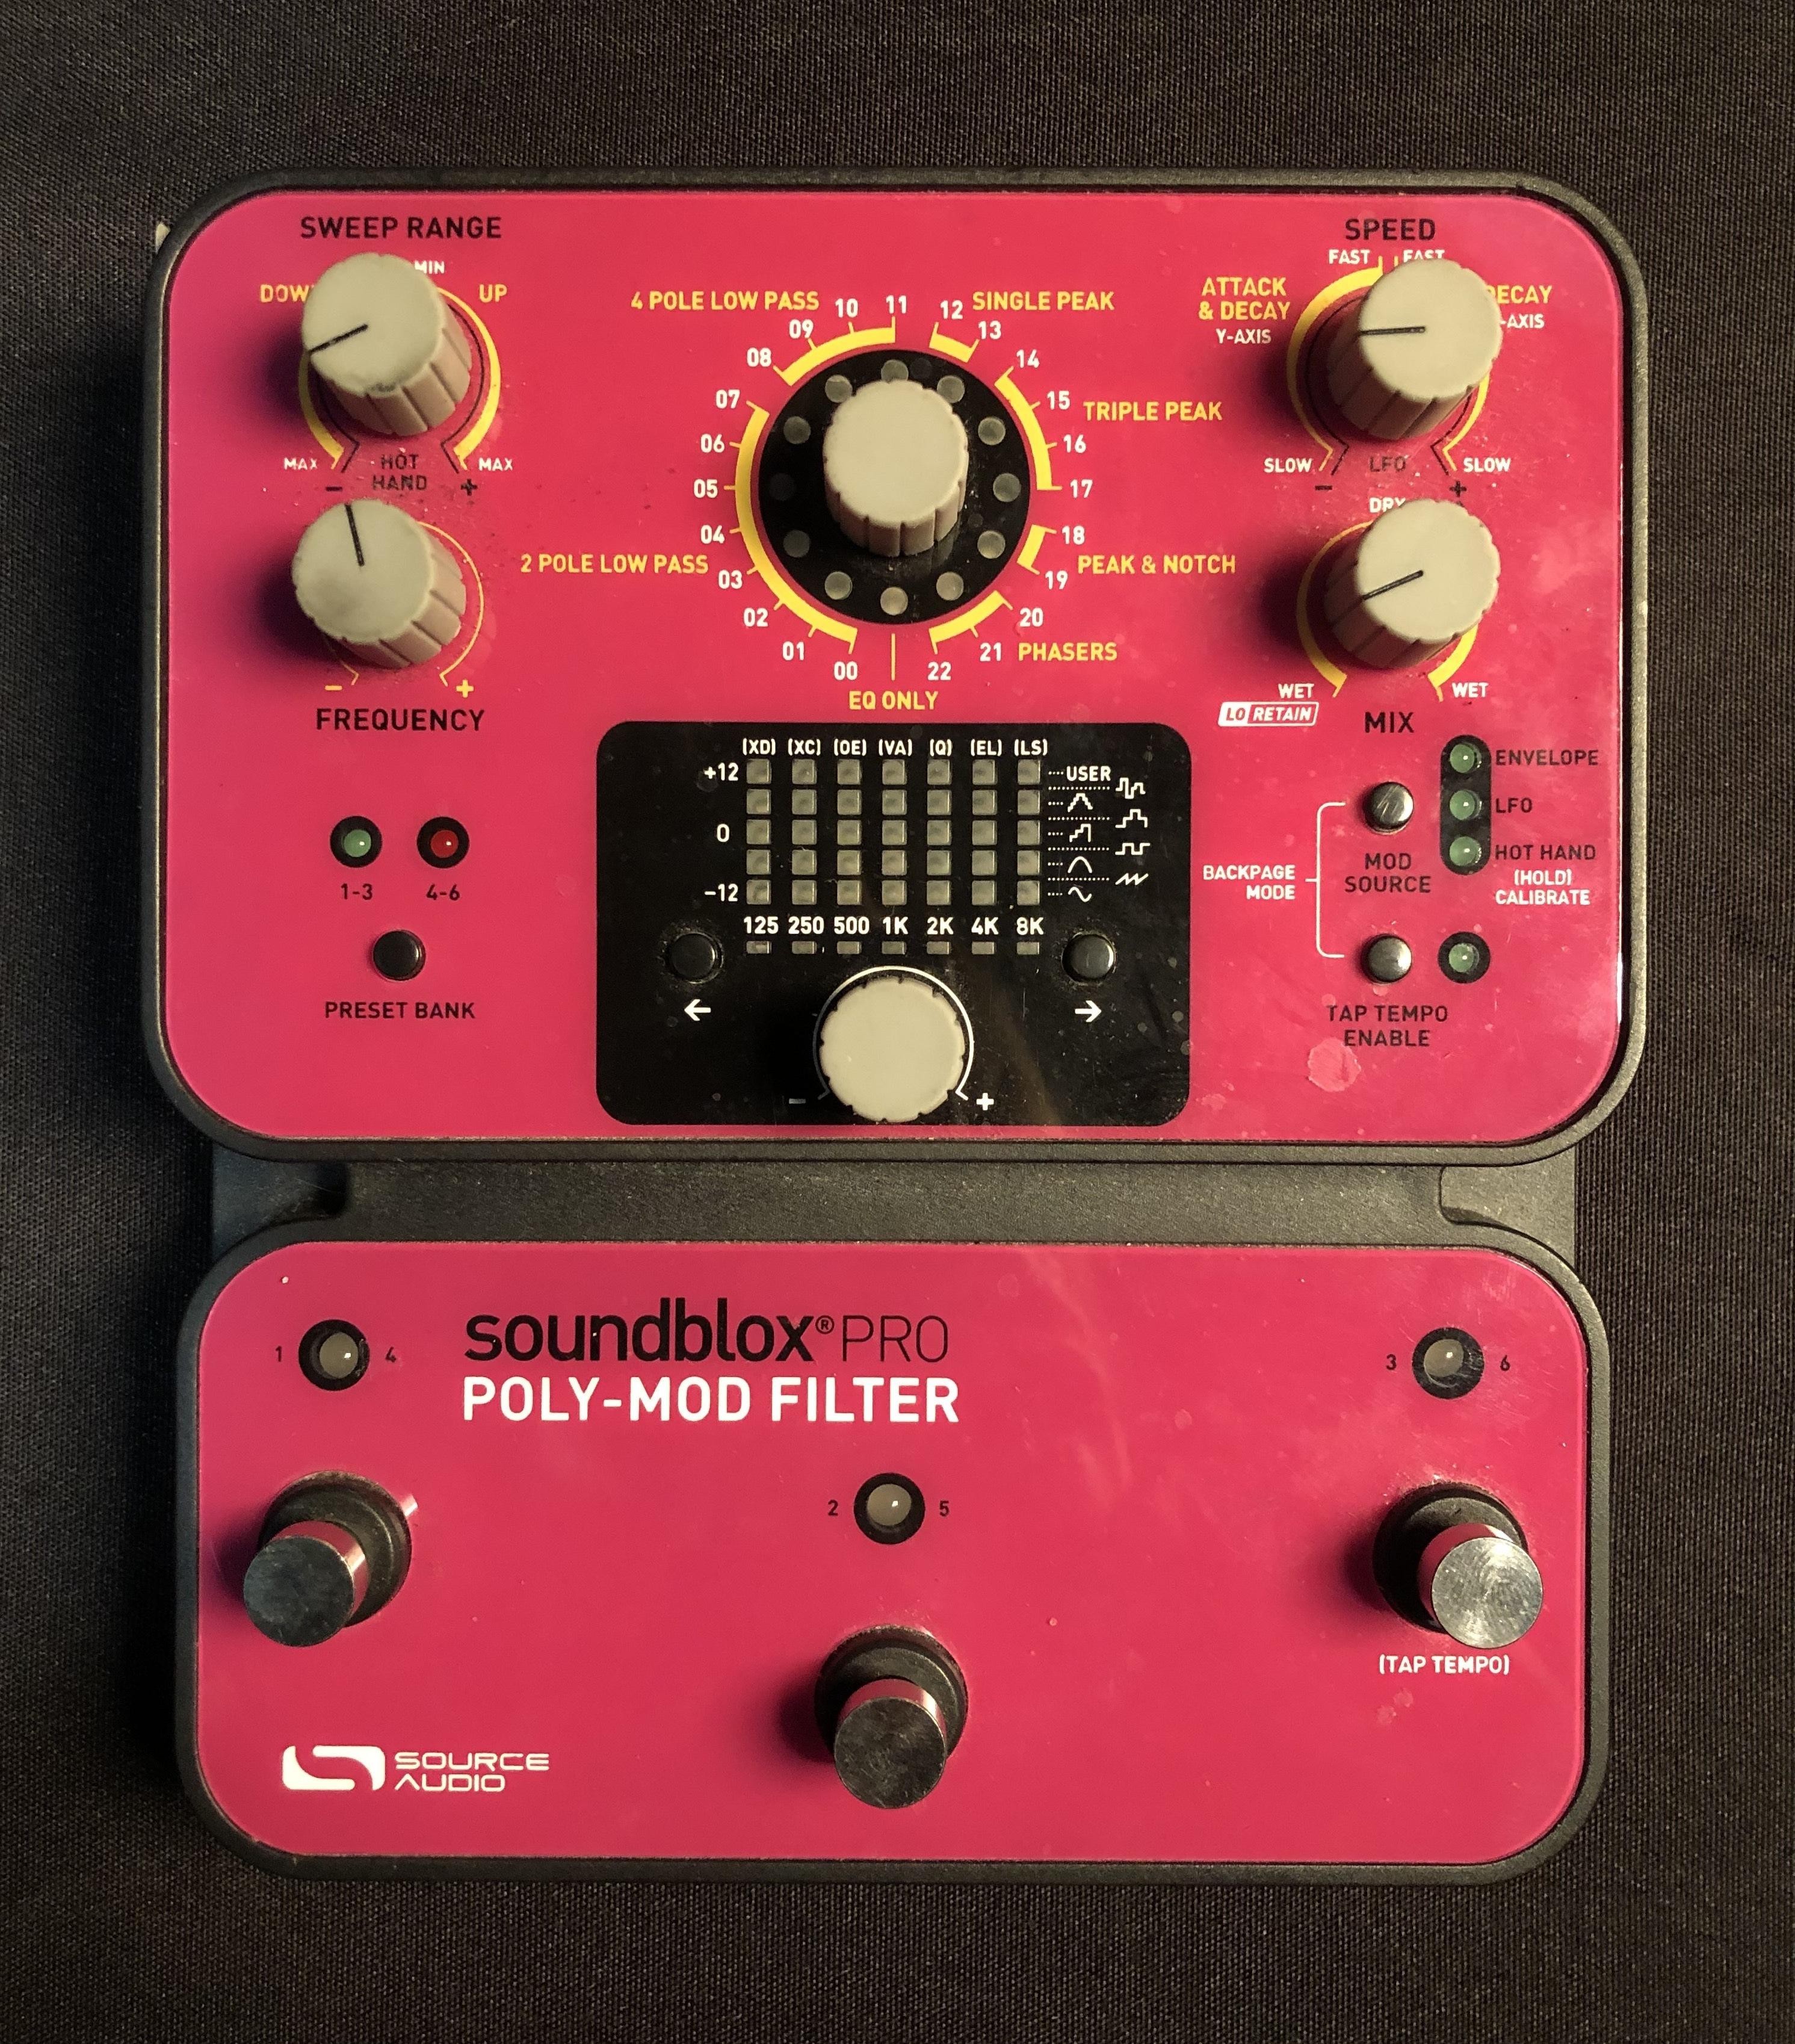 SOURCE AUDIO - Soundblox Pro Poly-Mod Filter